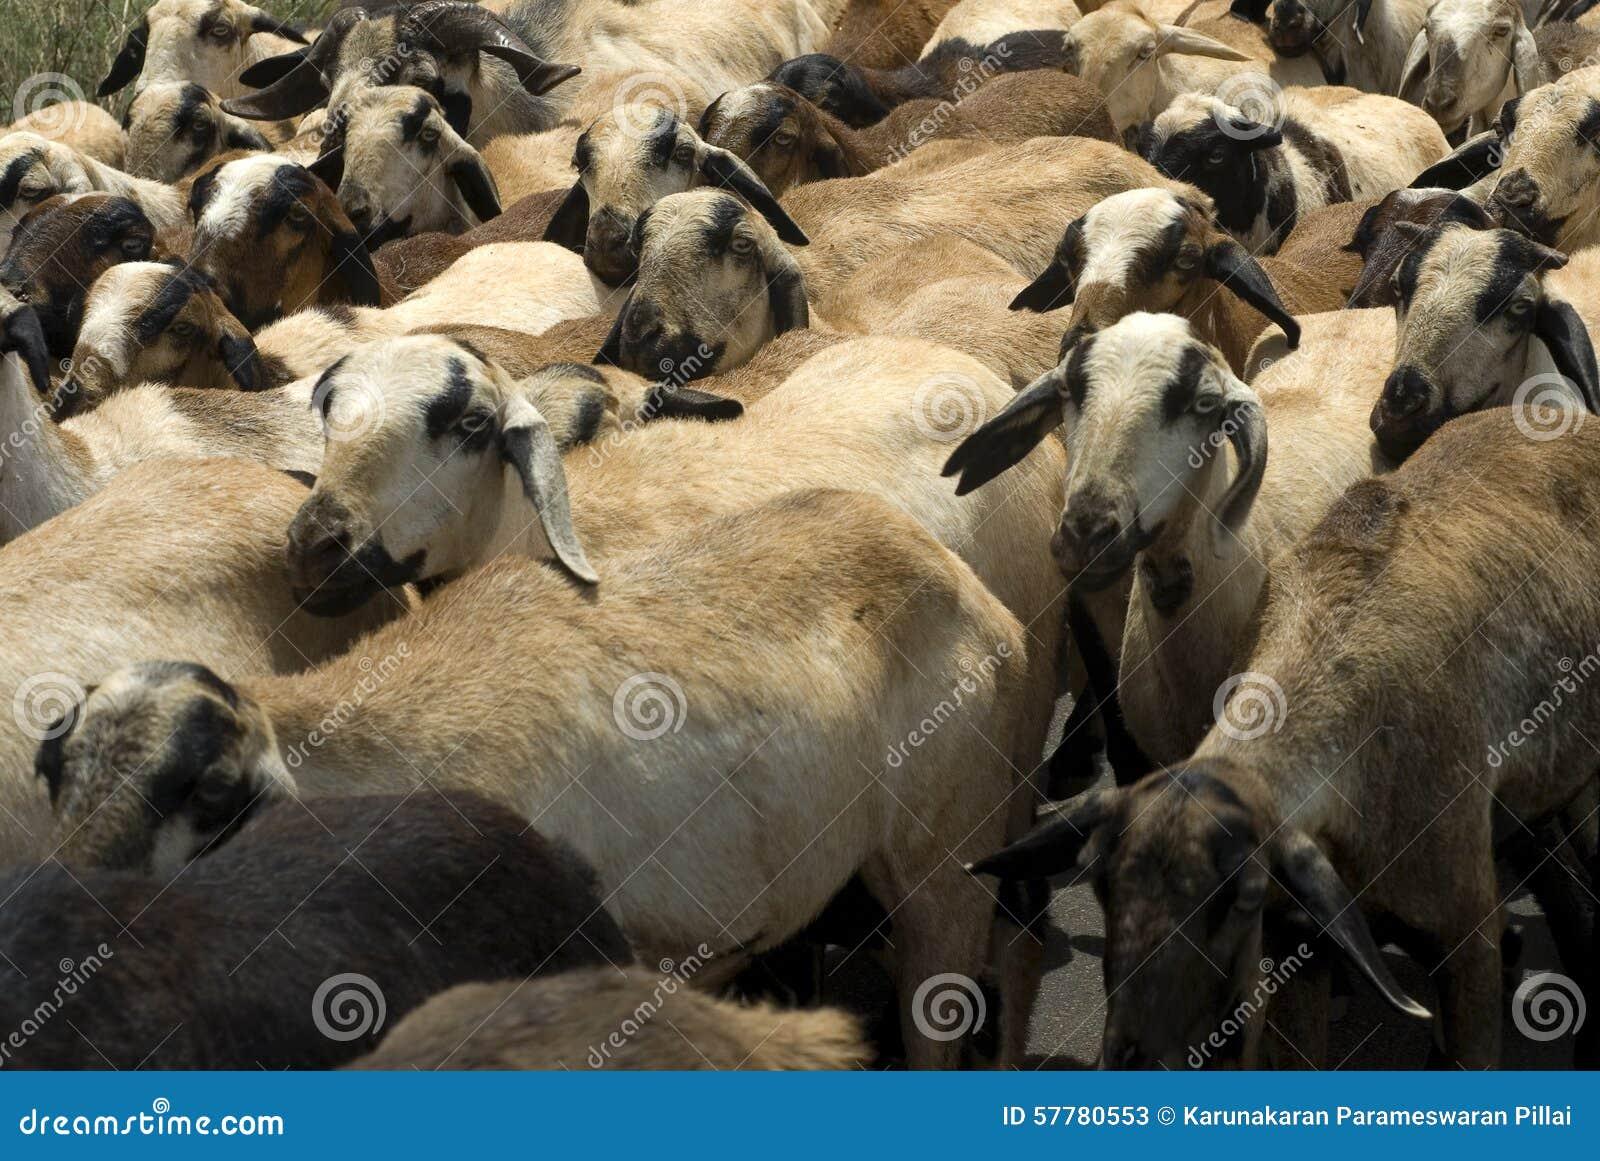 Animal husbandry goats rearing or goat farming